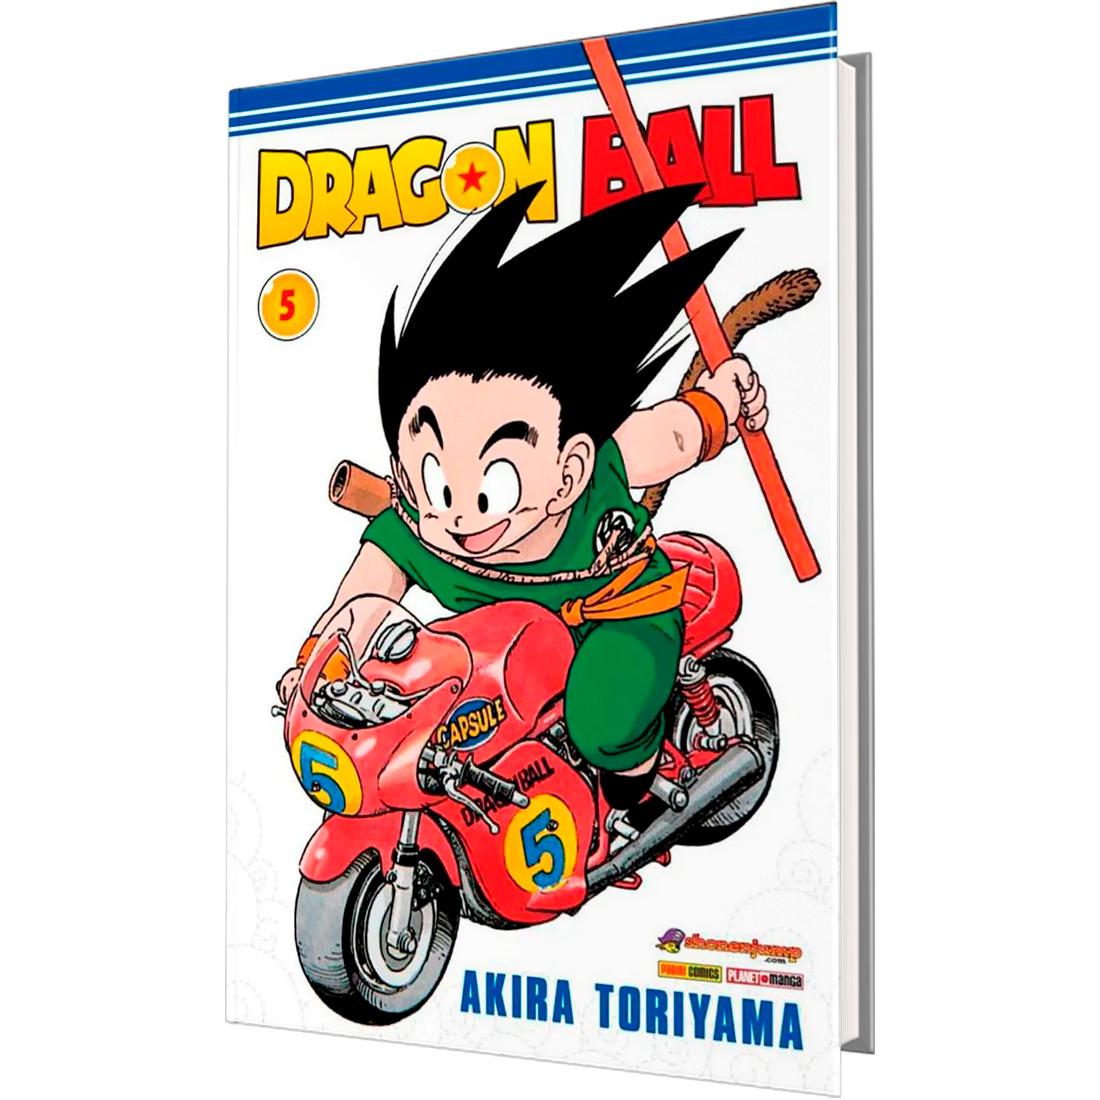 Dragon Ball Vol. 5